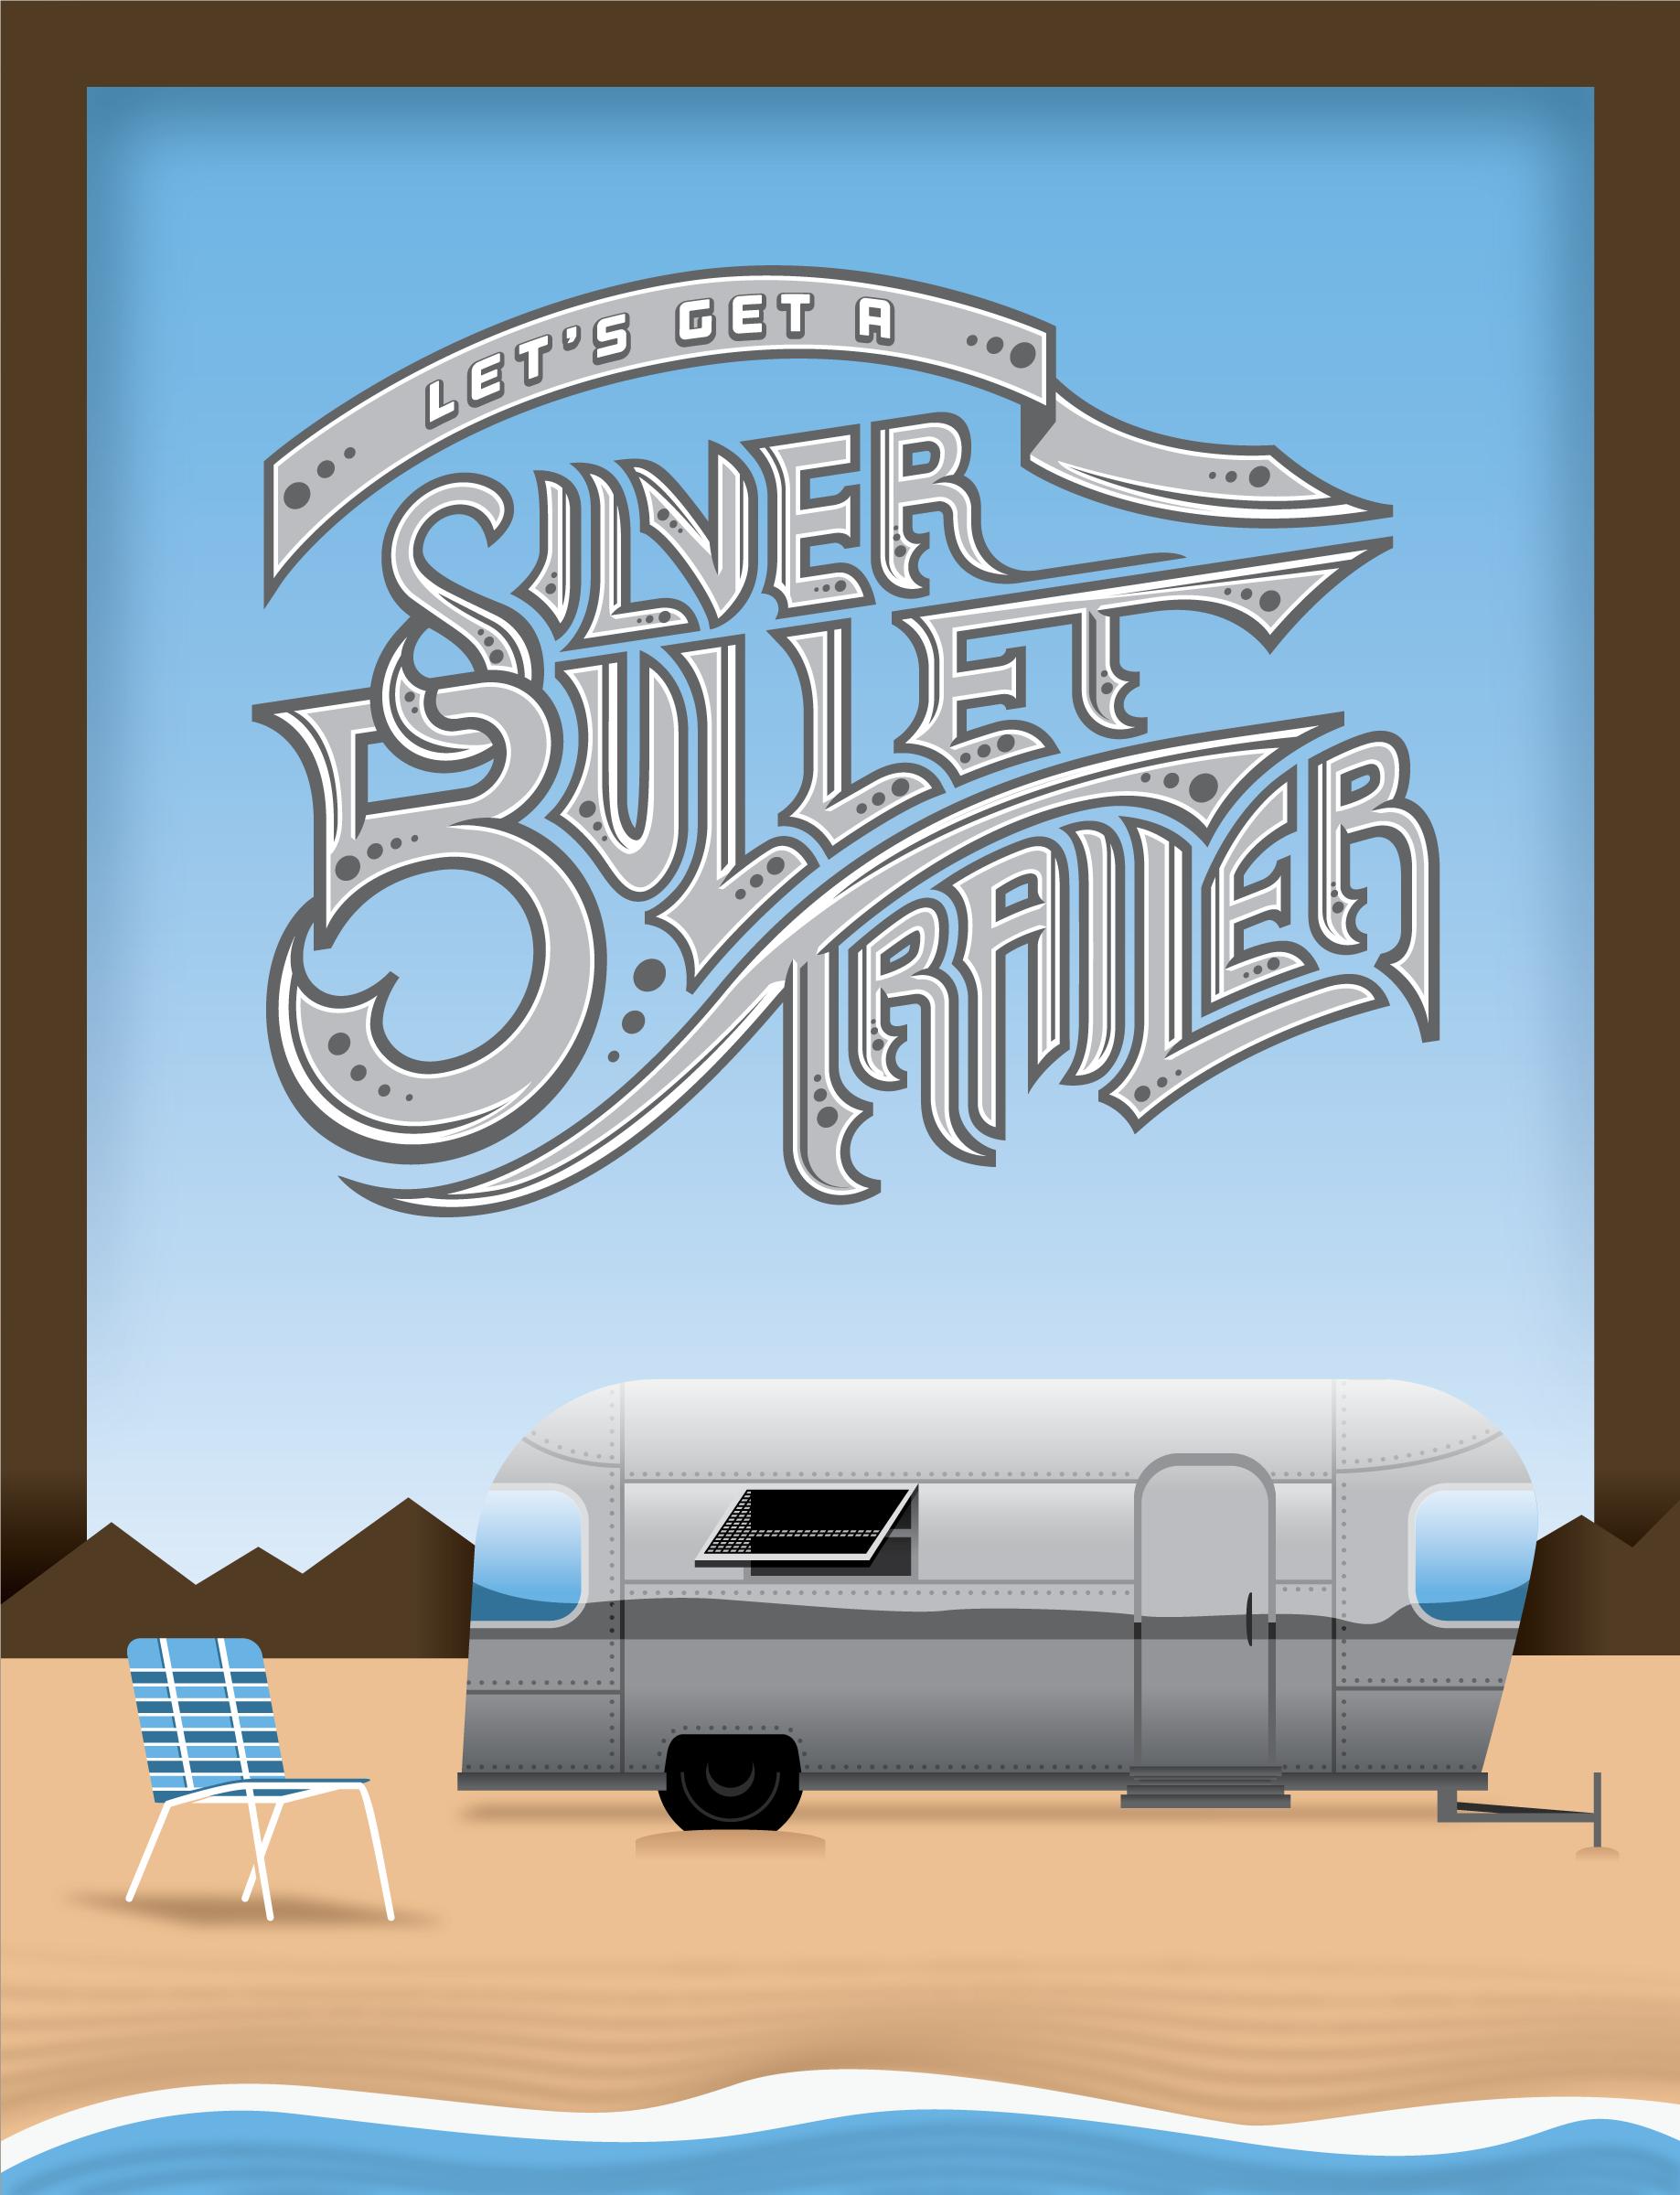 5-silver-bullet-trailer.png